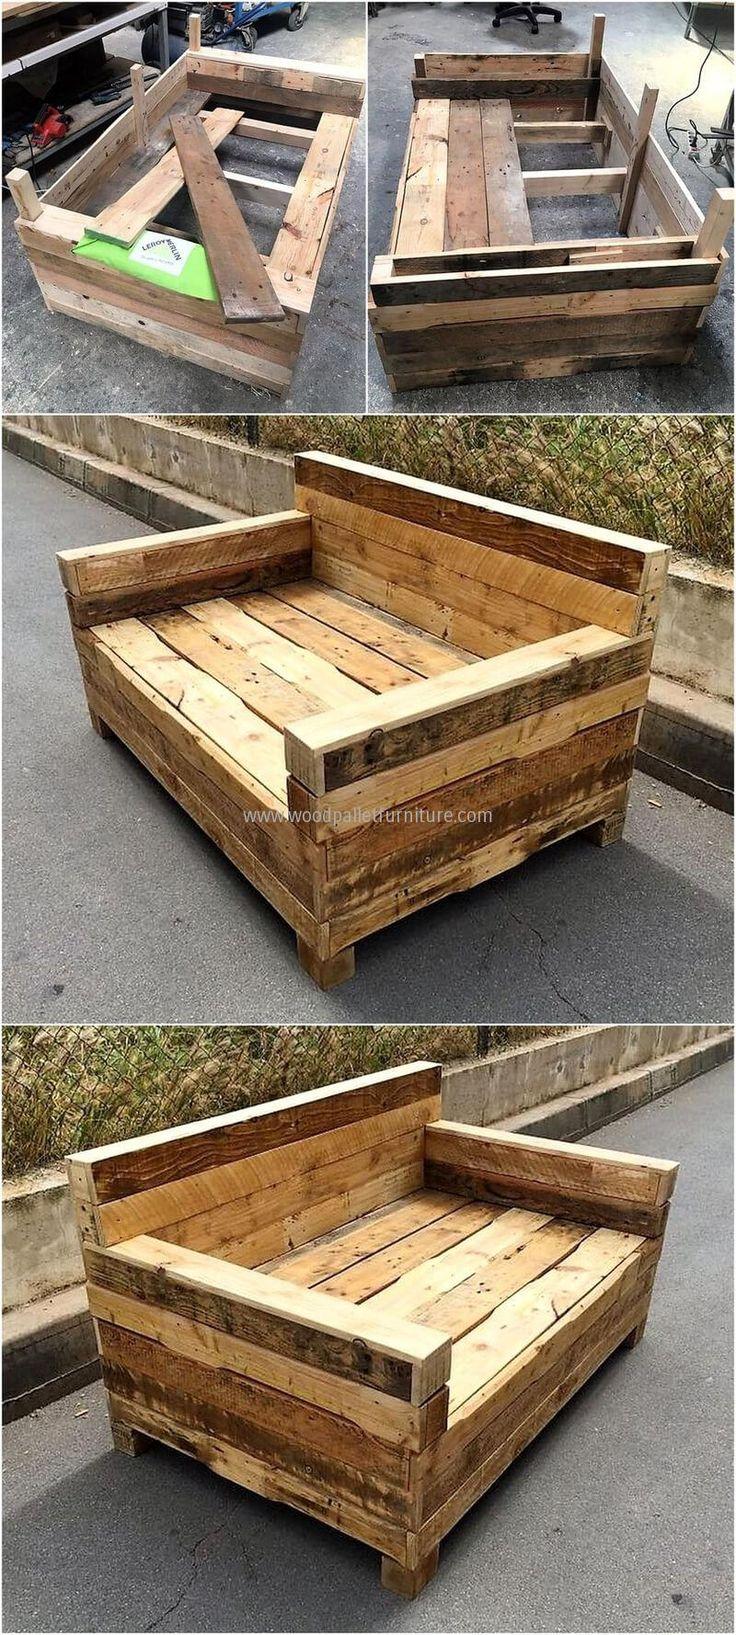 diy wooden pallet couch plan